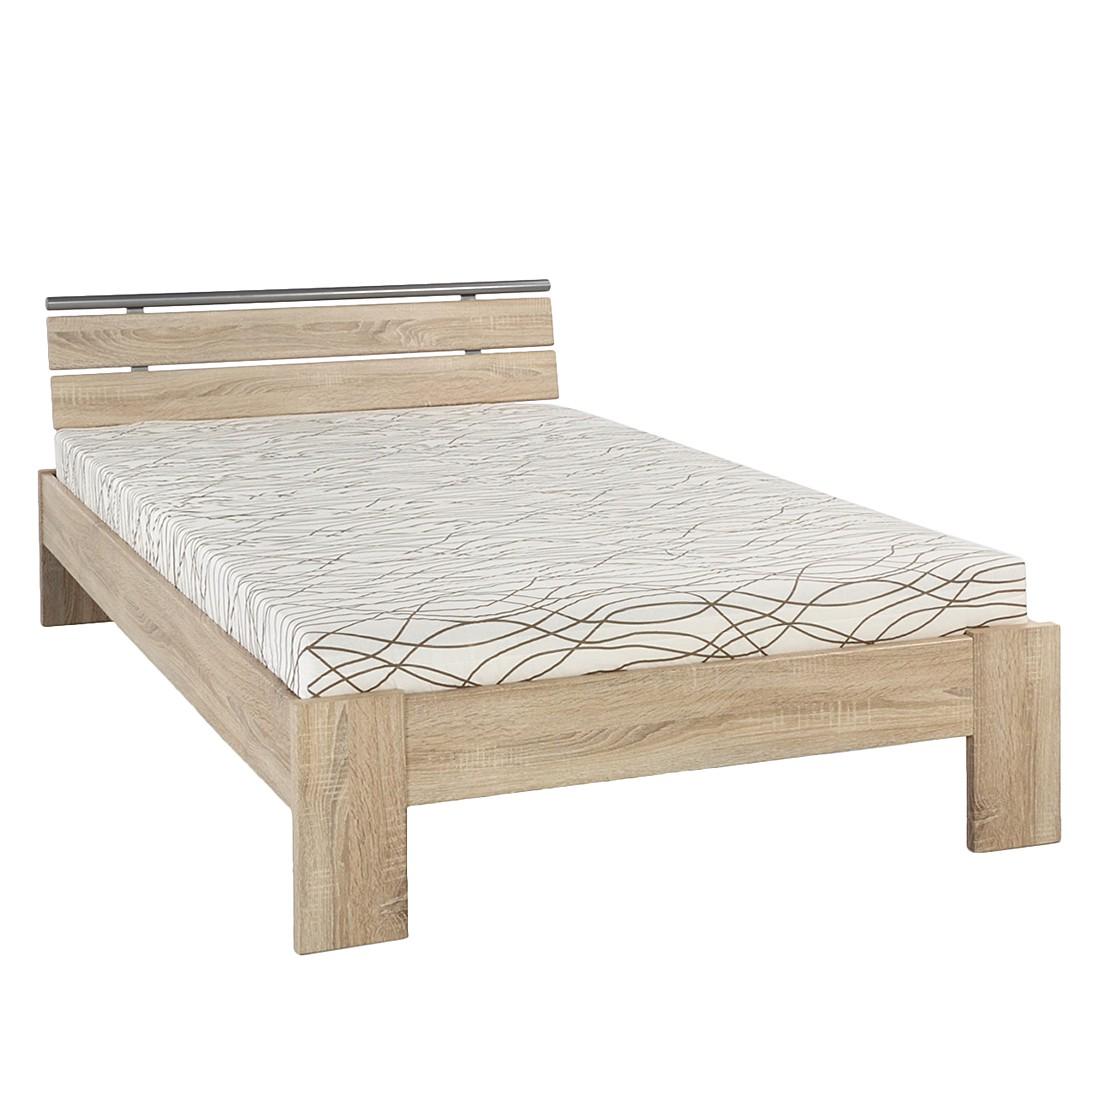 206 guide d 39 achat. Black Bedroom Furniture Sets. Home Design Ideas